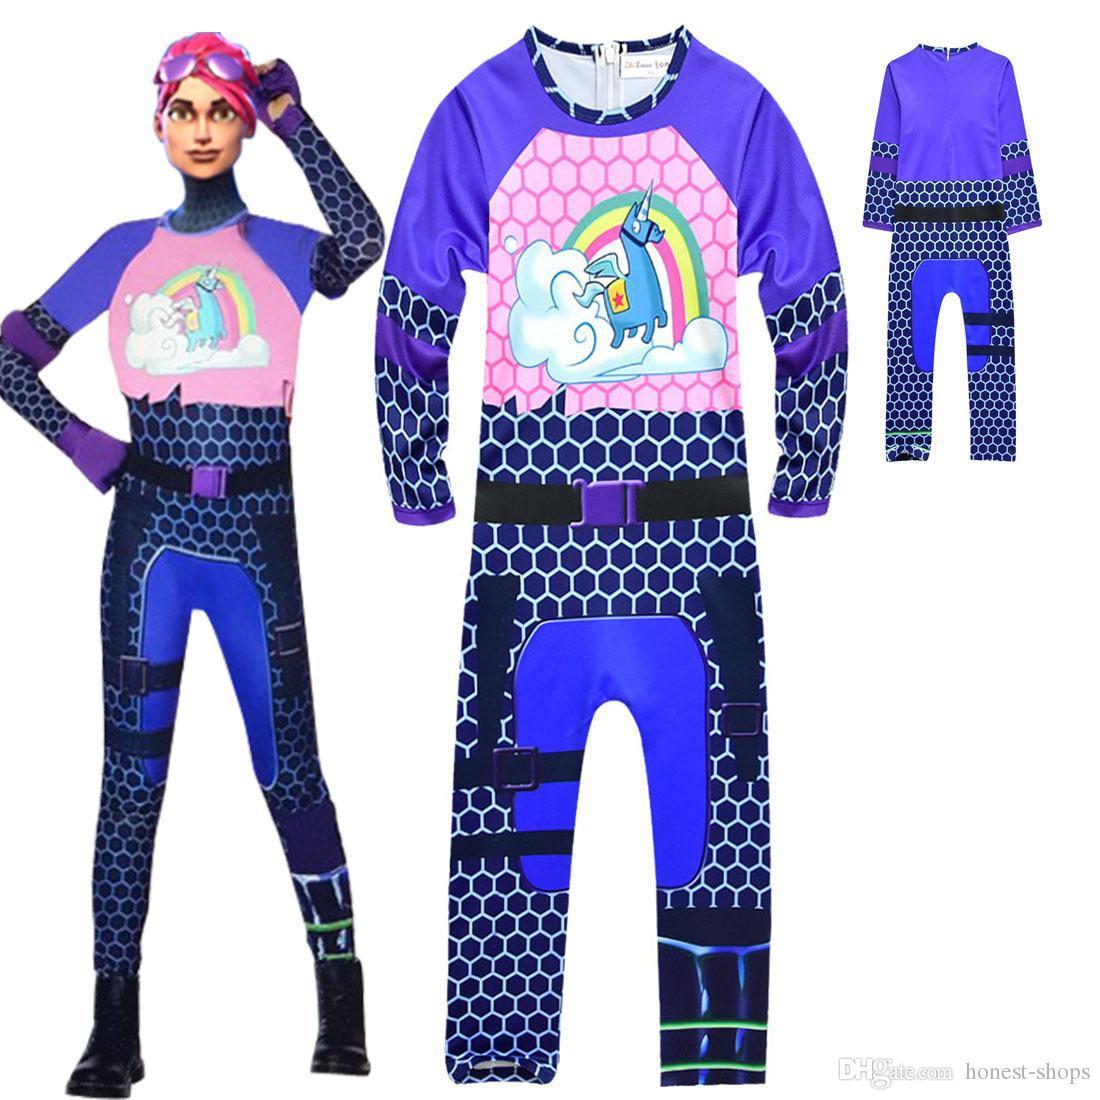 Ins Girls Fortnite Unicorn Jumpsuit Game Fortnite Cosplay Big Child